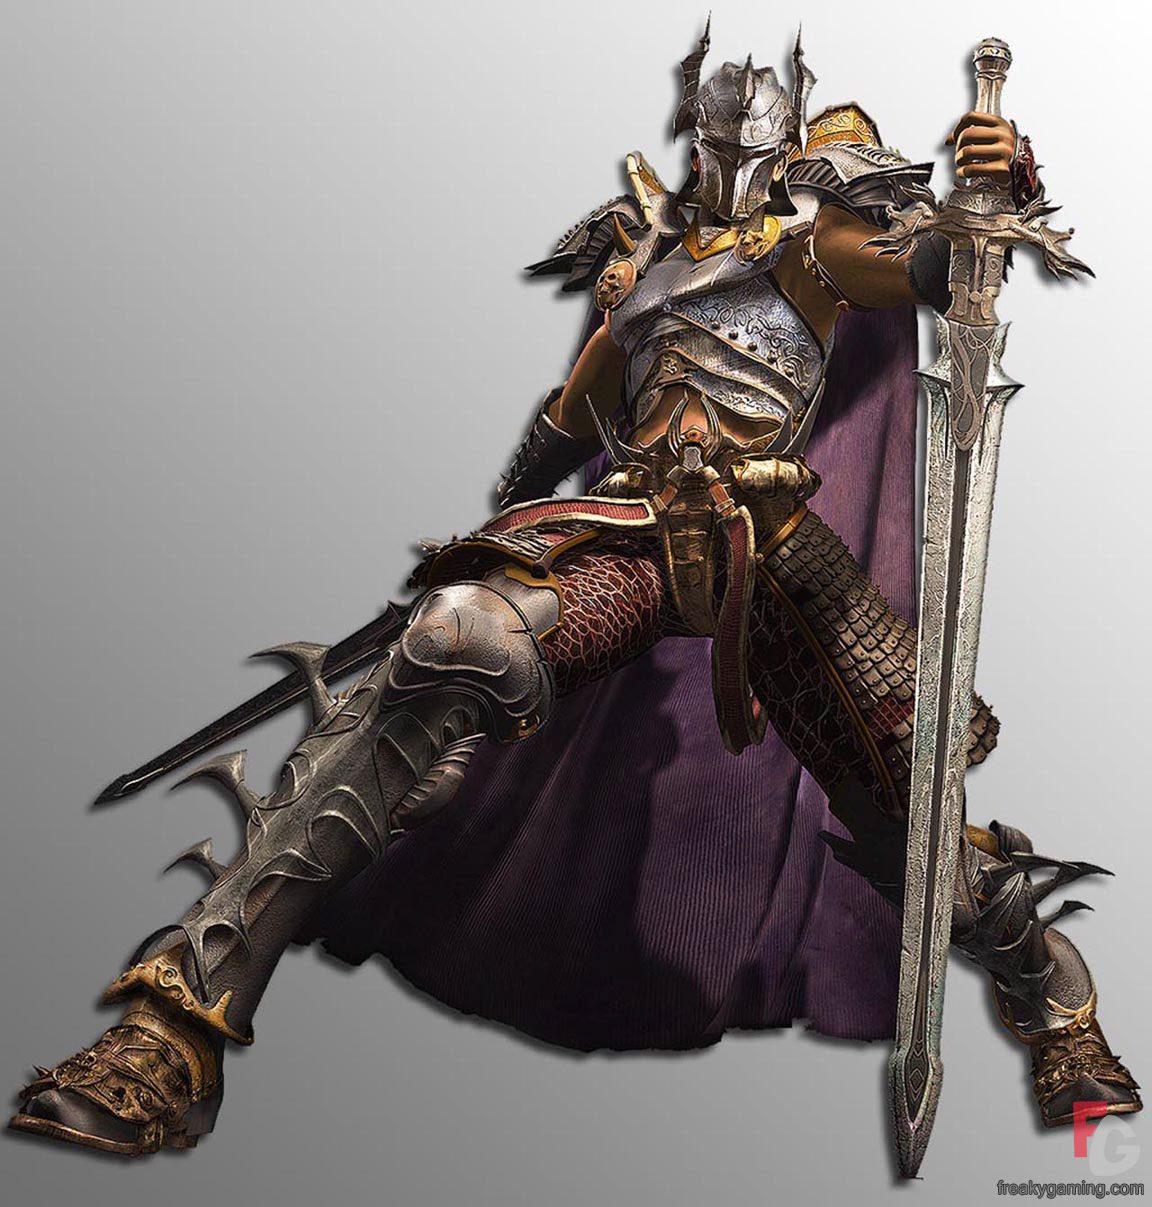 HQ Swordsman Wallpapers | File 193.79Kb